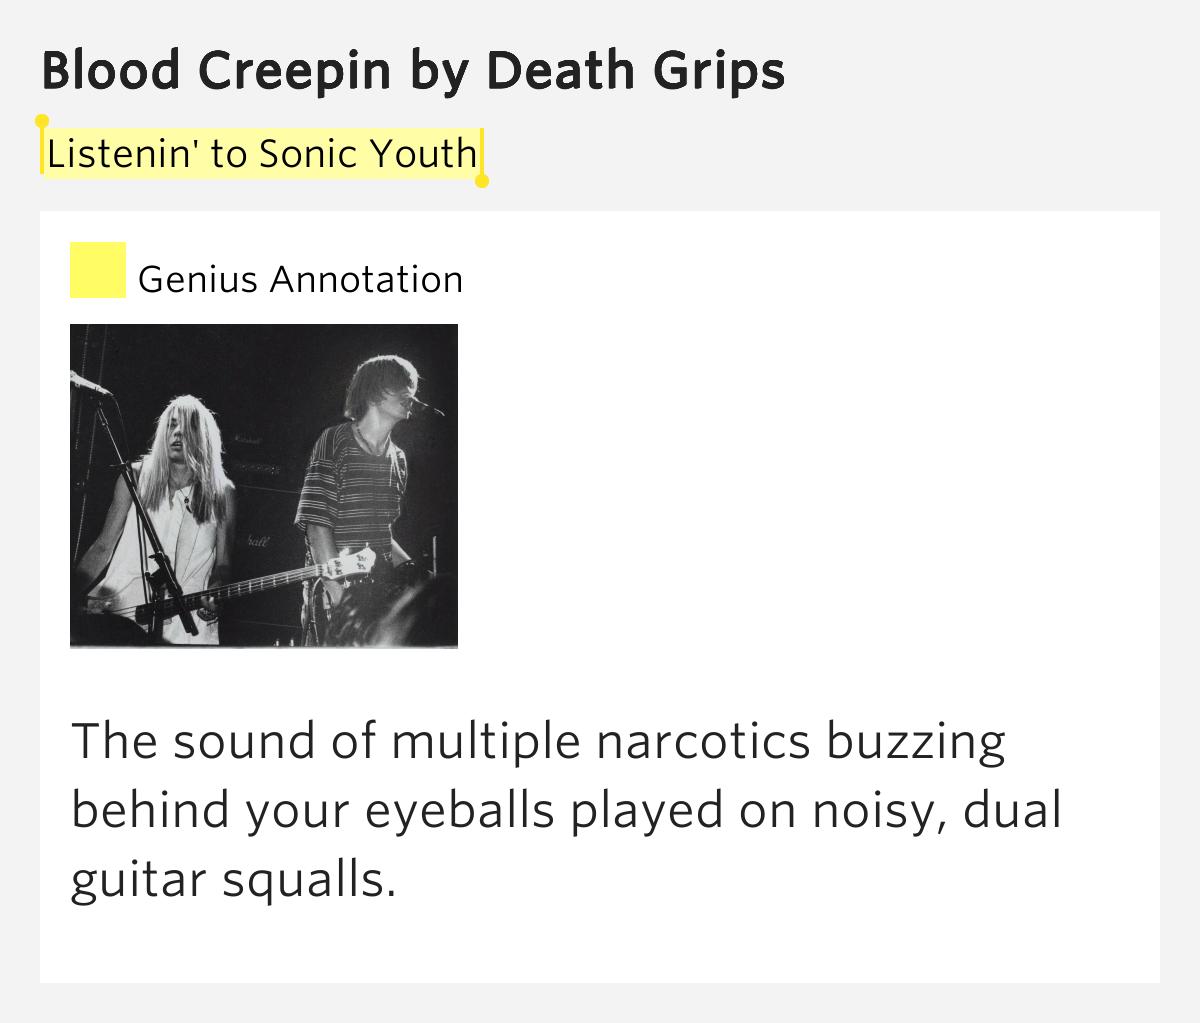 Metallica - Creeping Death Lyrics | MetroLyrics